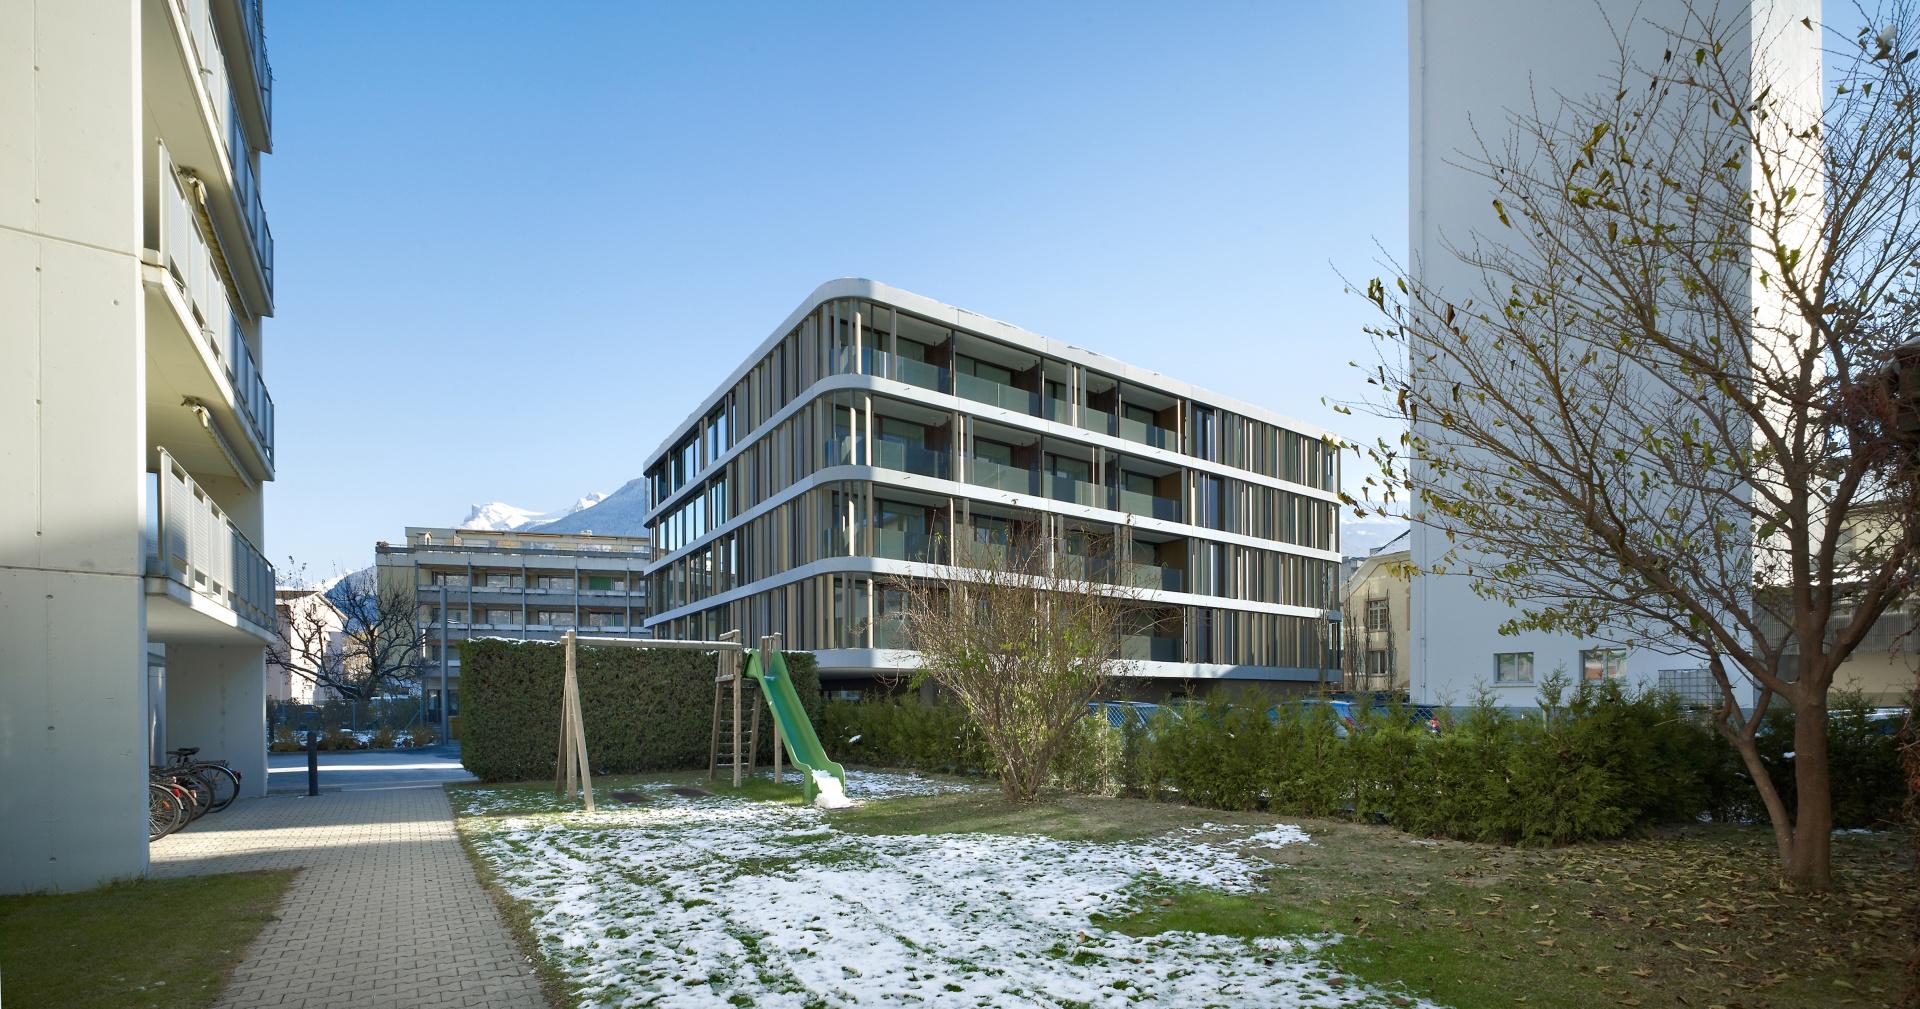 Aussenansicht © Ruedi Walti, Basel